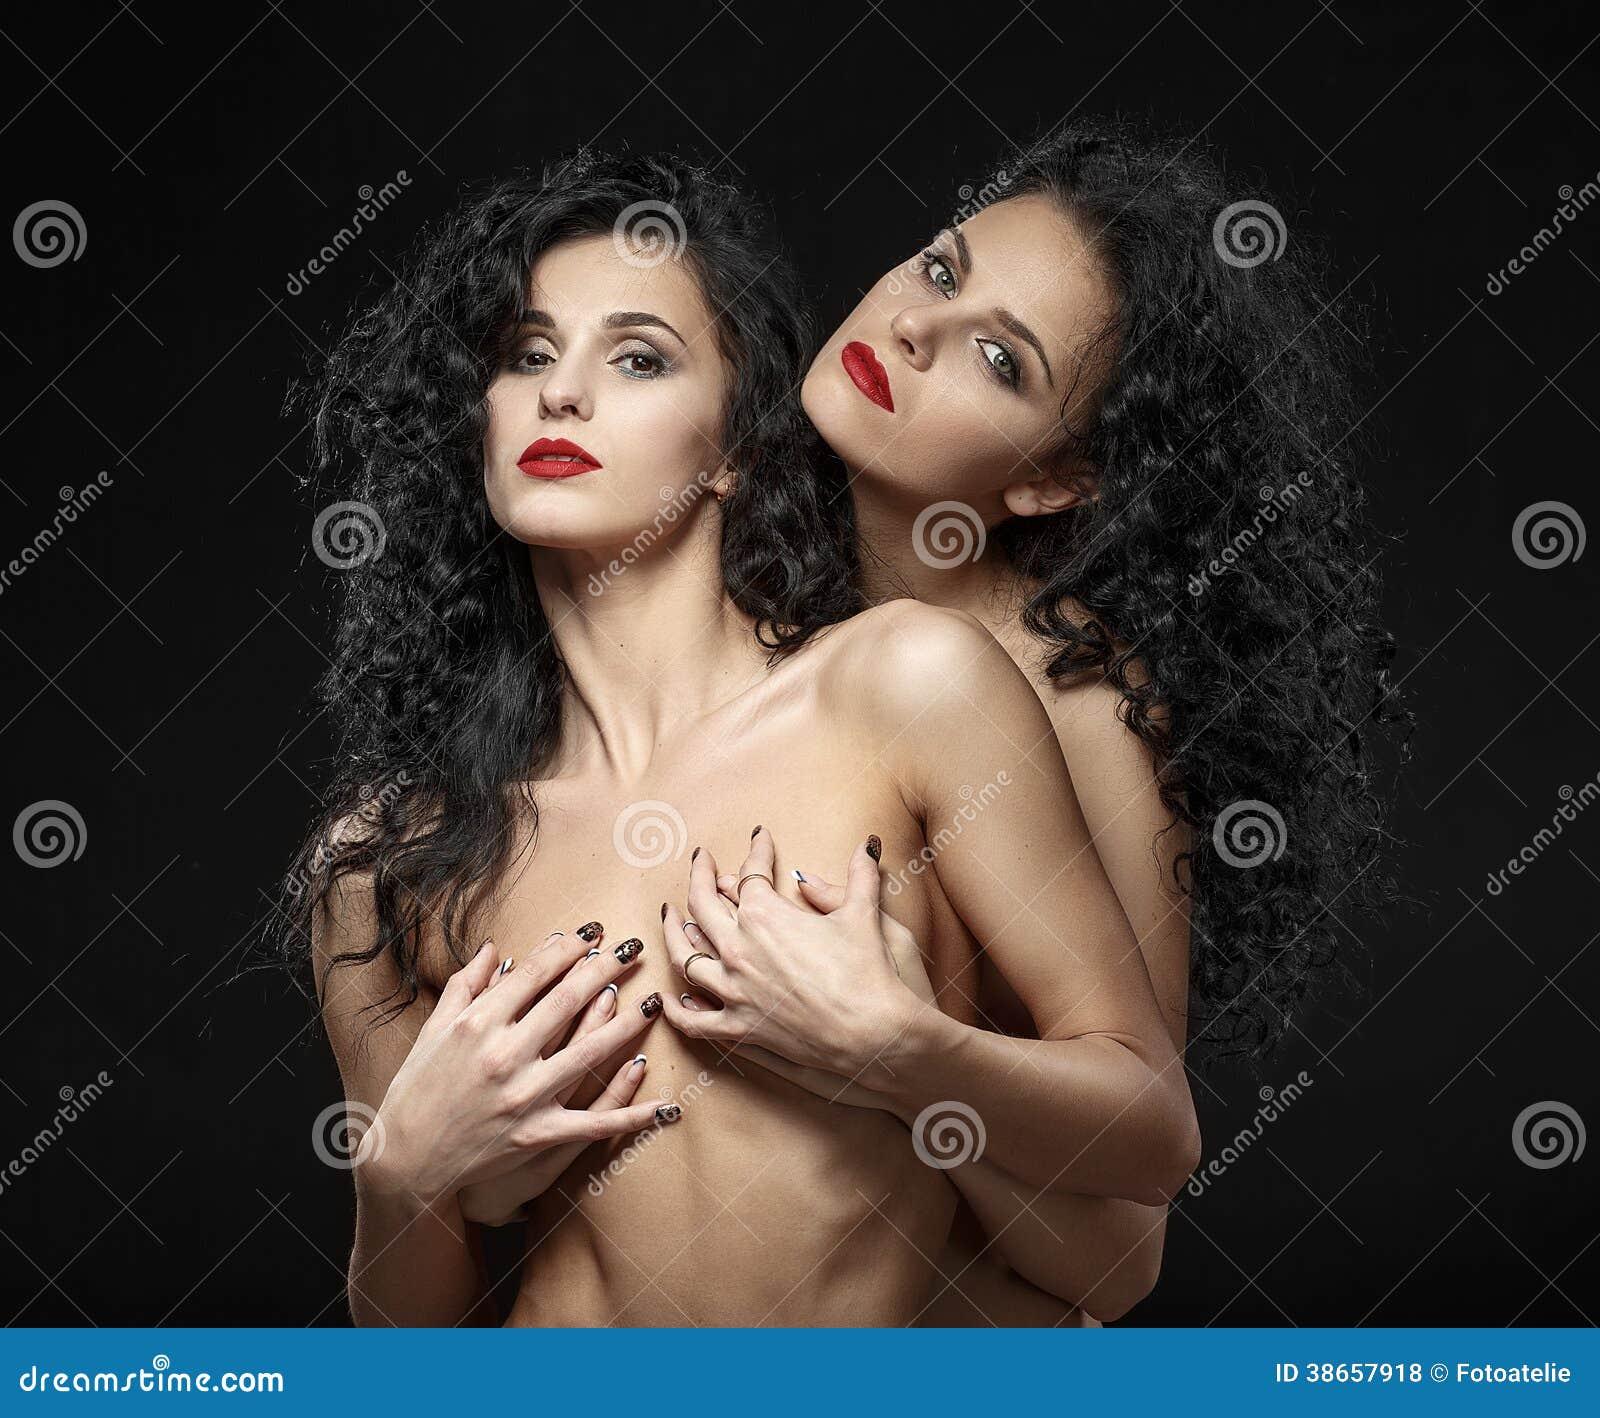 lesbisk flicka pic enorma cum gay Porr